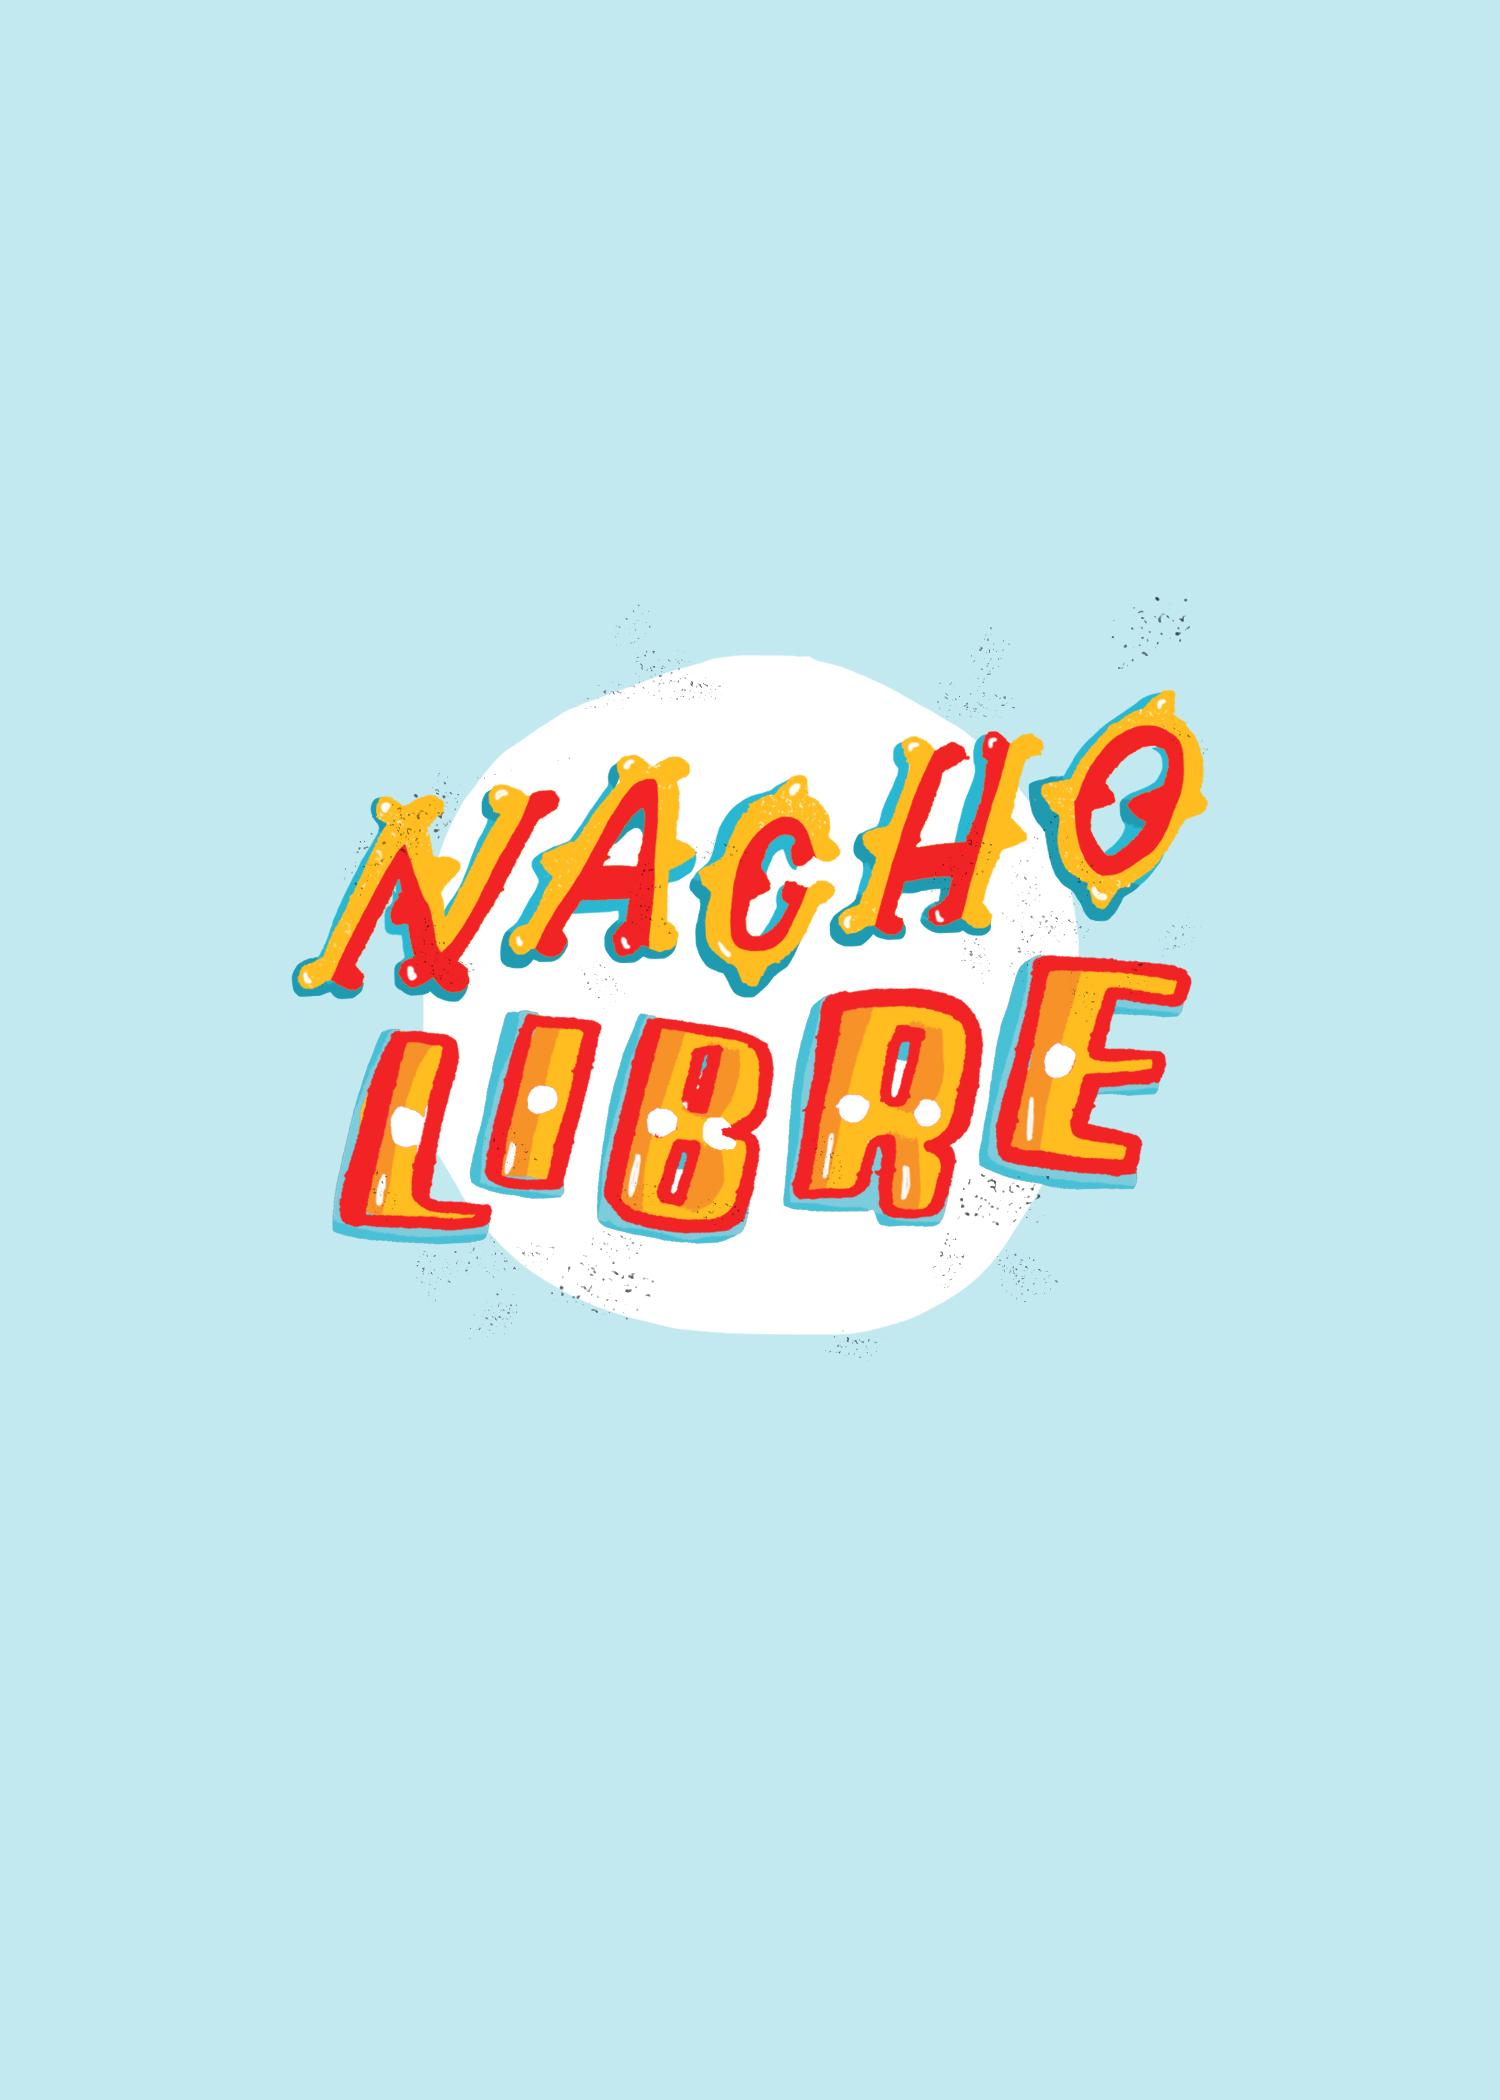 1.NachoLibre.jpg